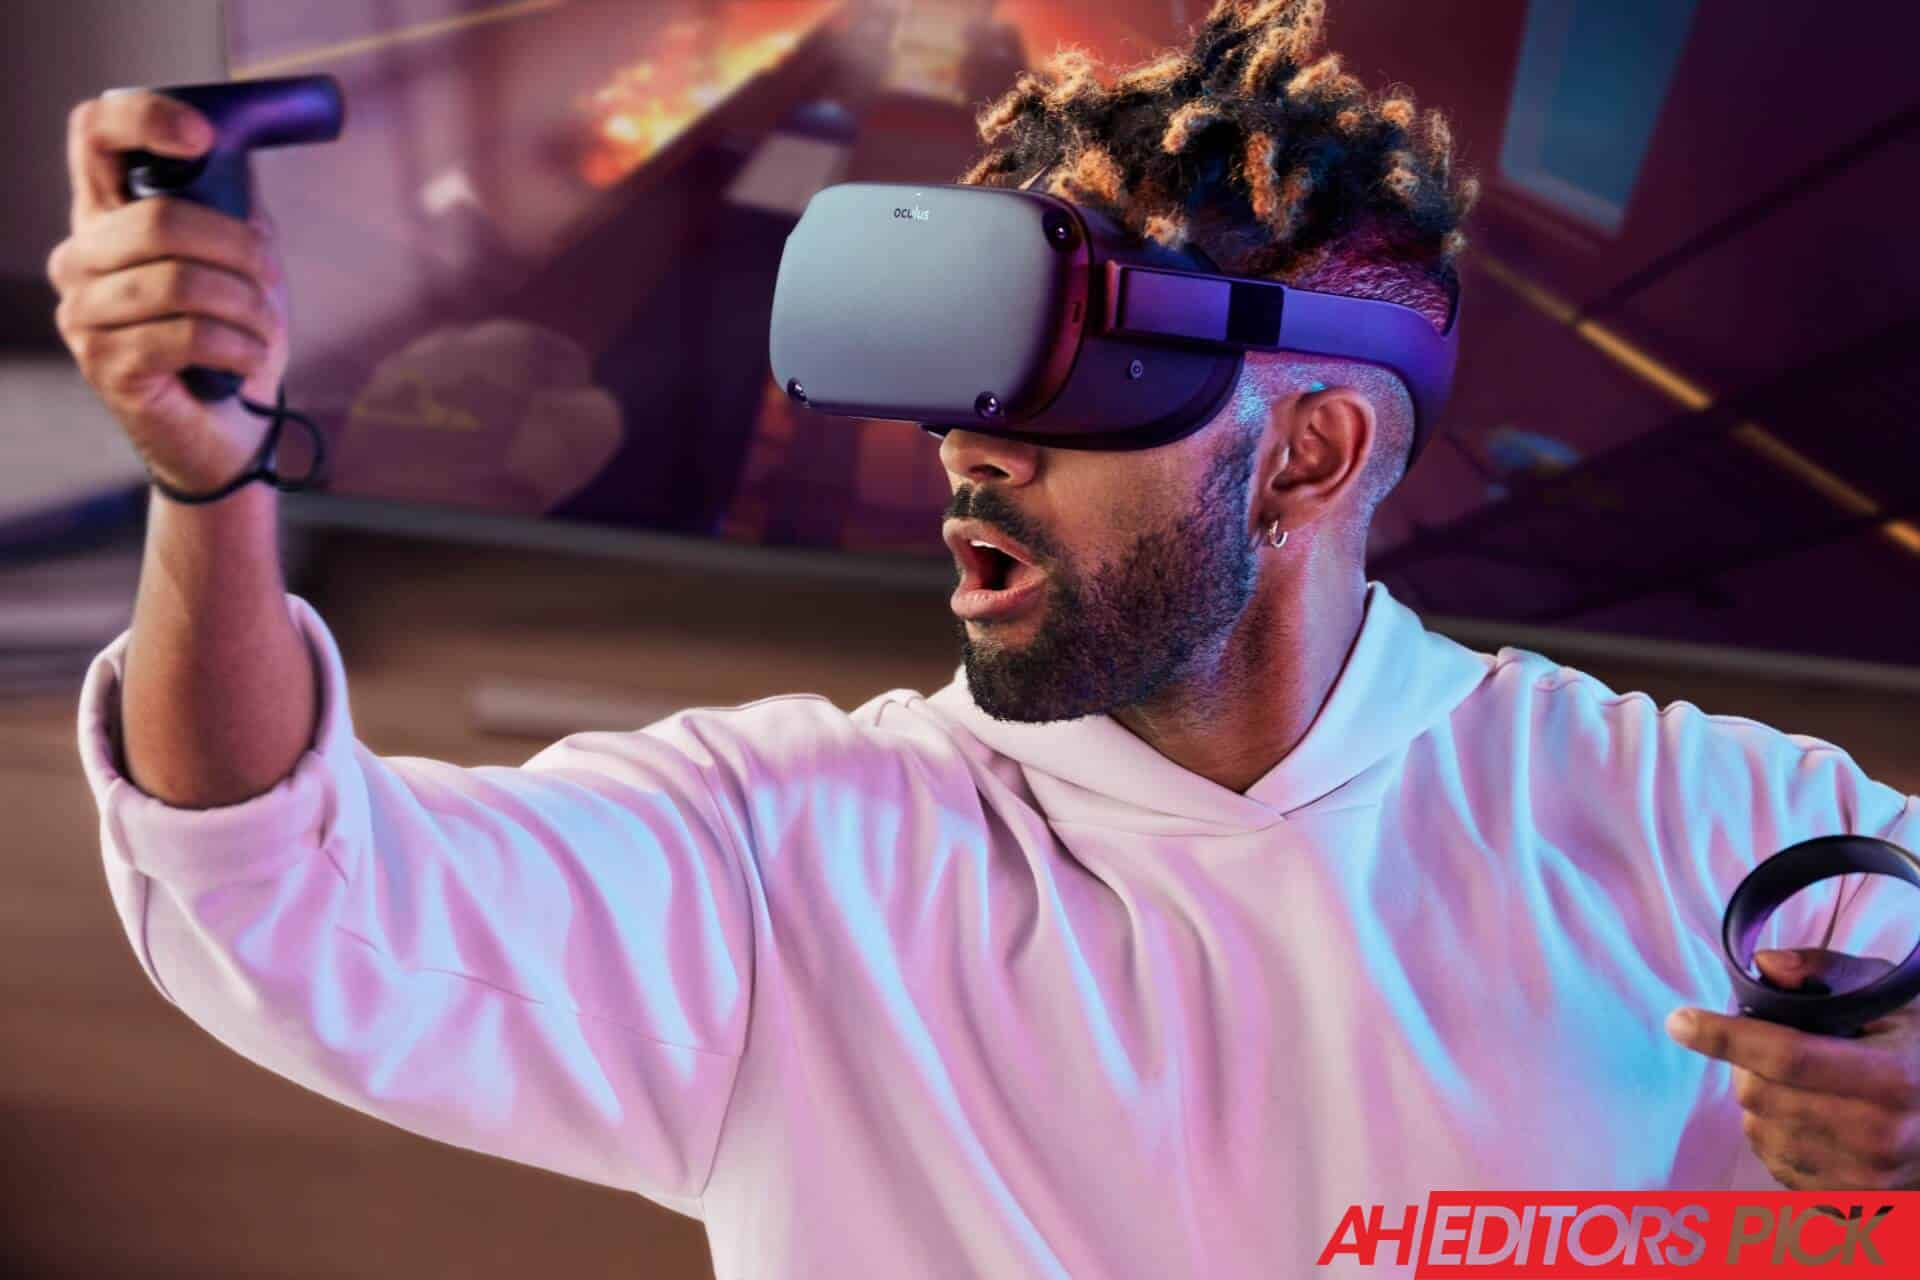 Oculus Quest Editors Pick